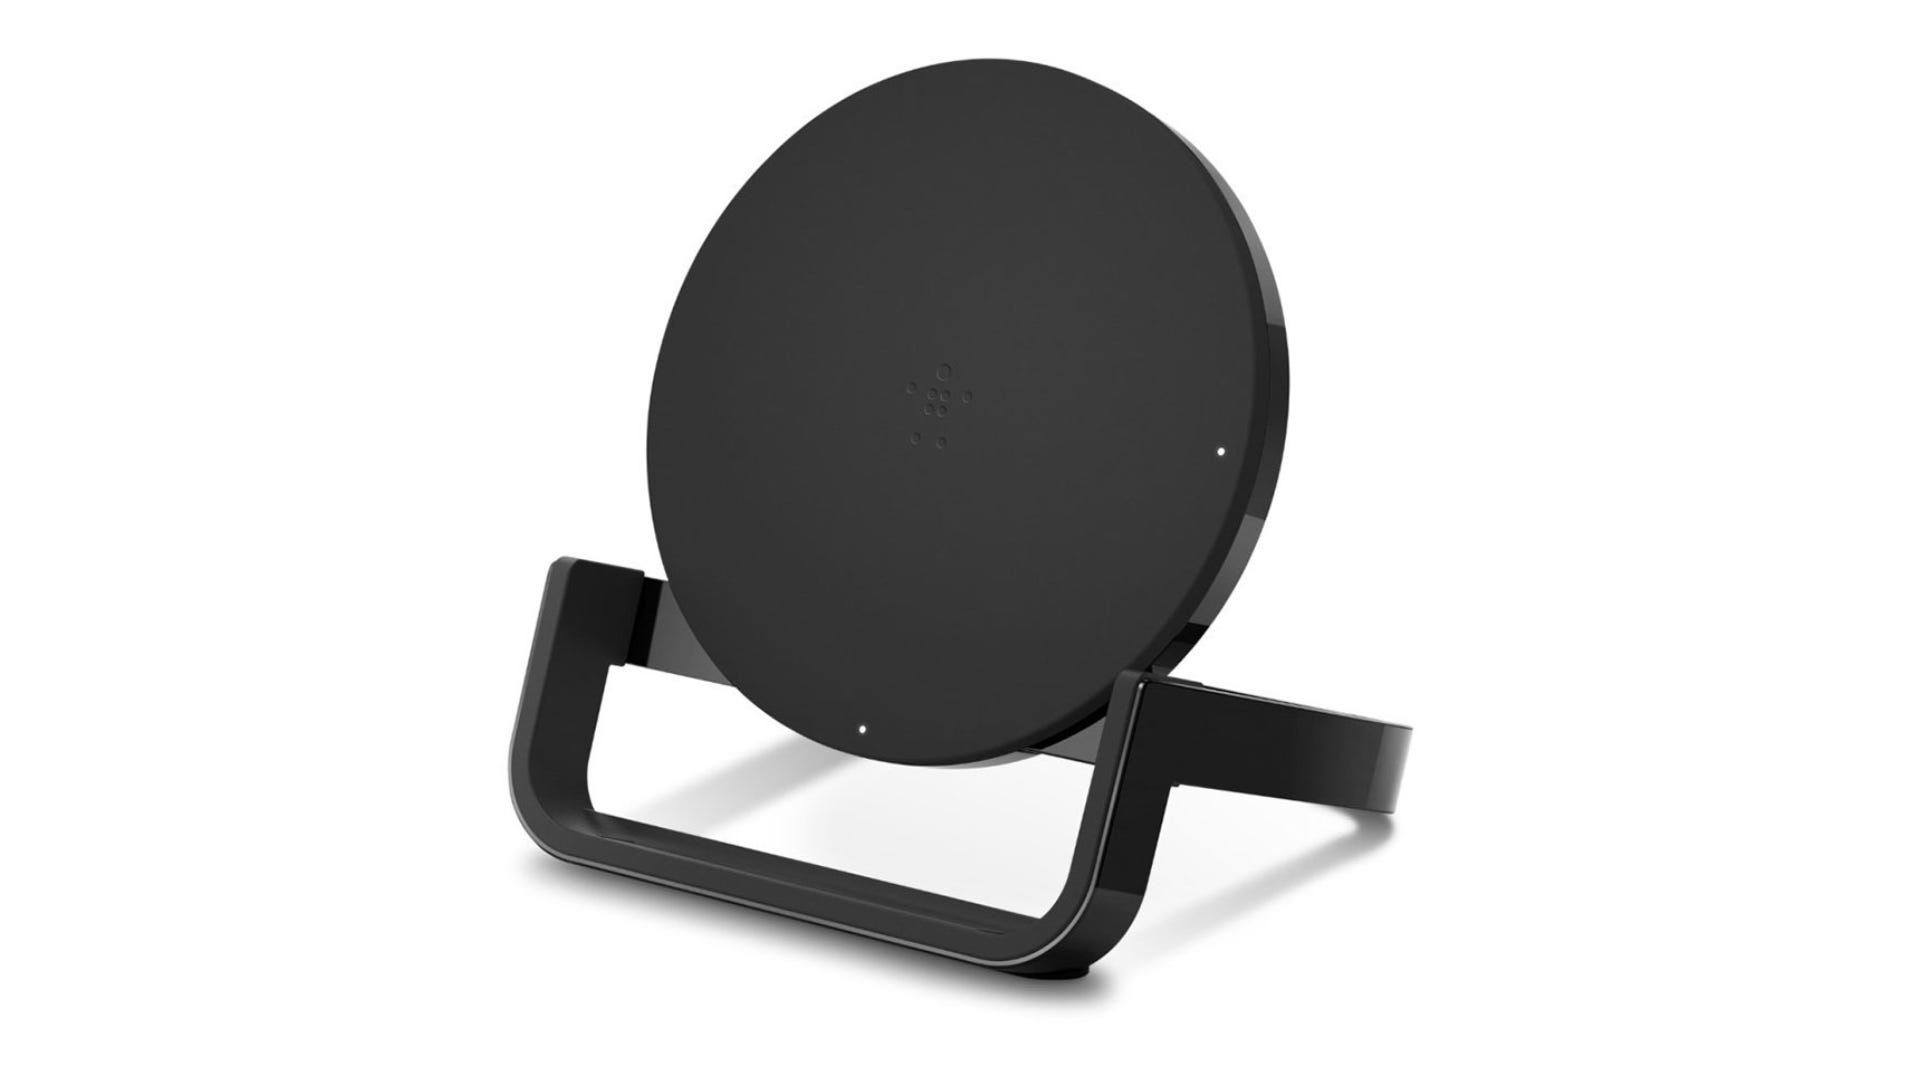 Render of Belkin's Boost Wireless Charging Stand